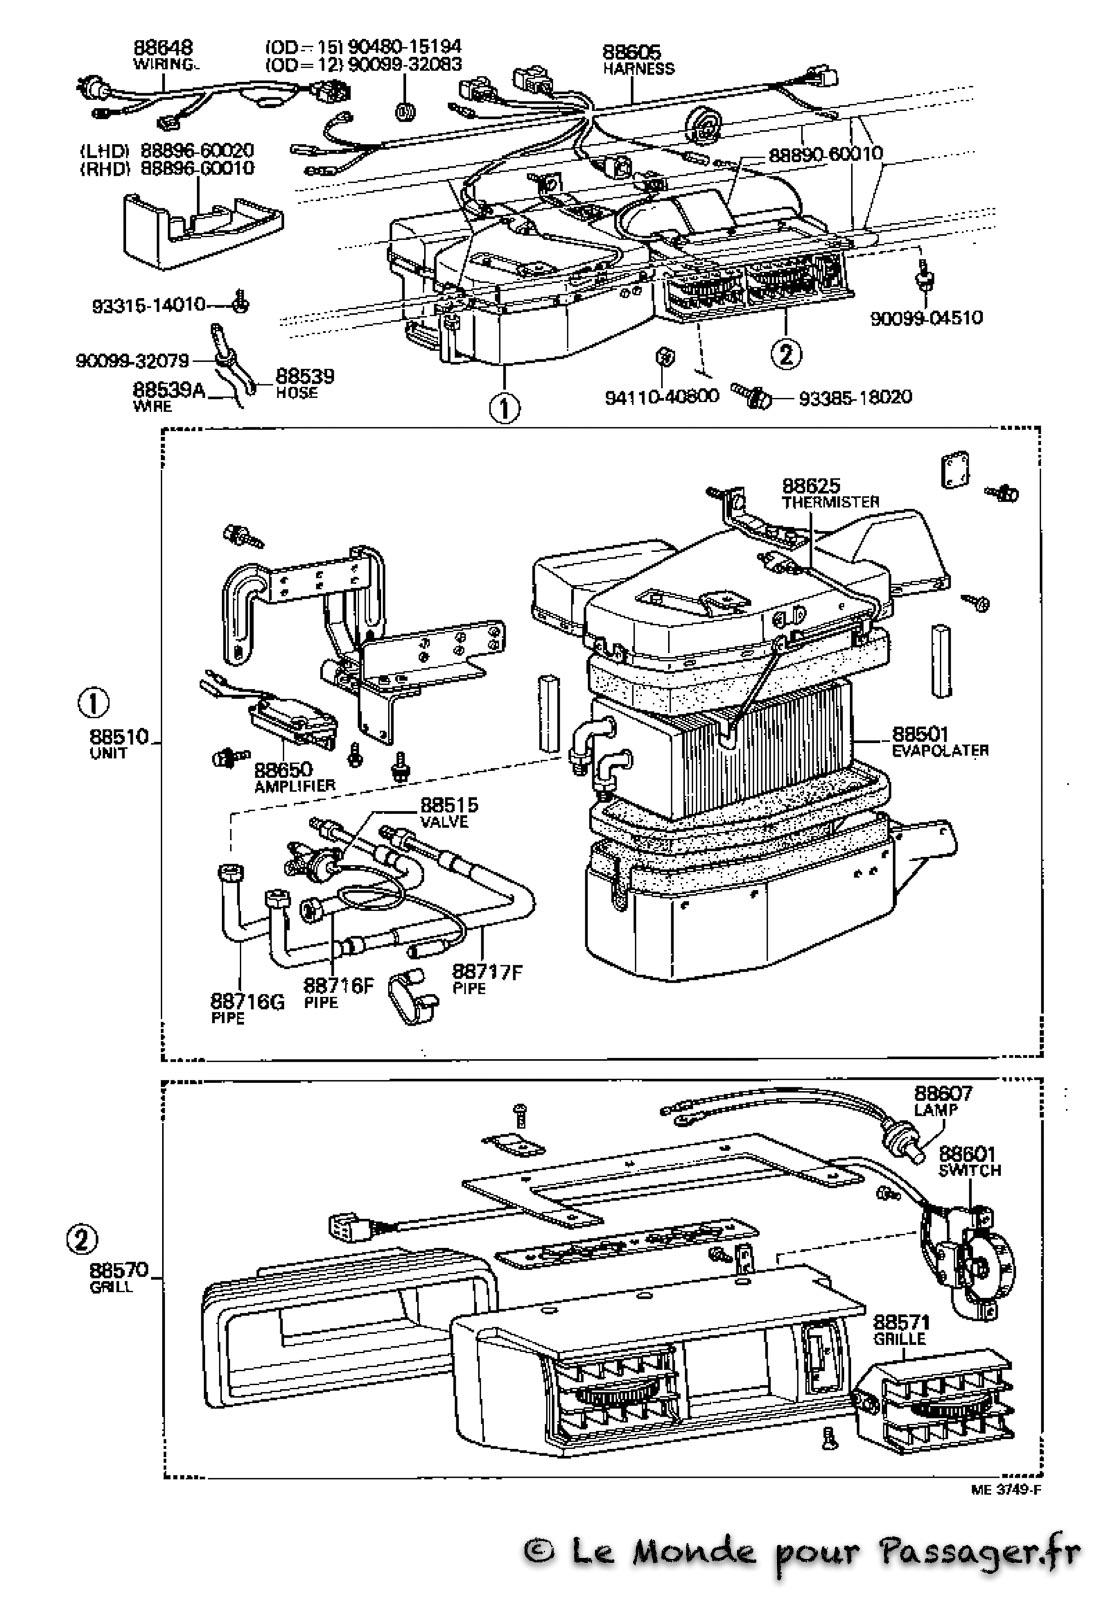 Fj55-Eclatés-Techniques123